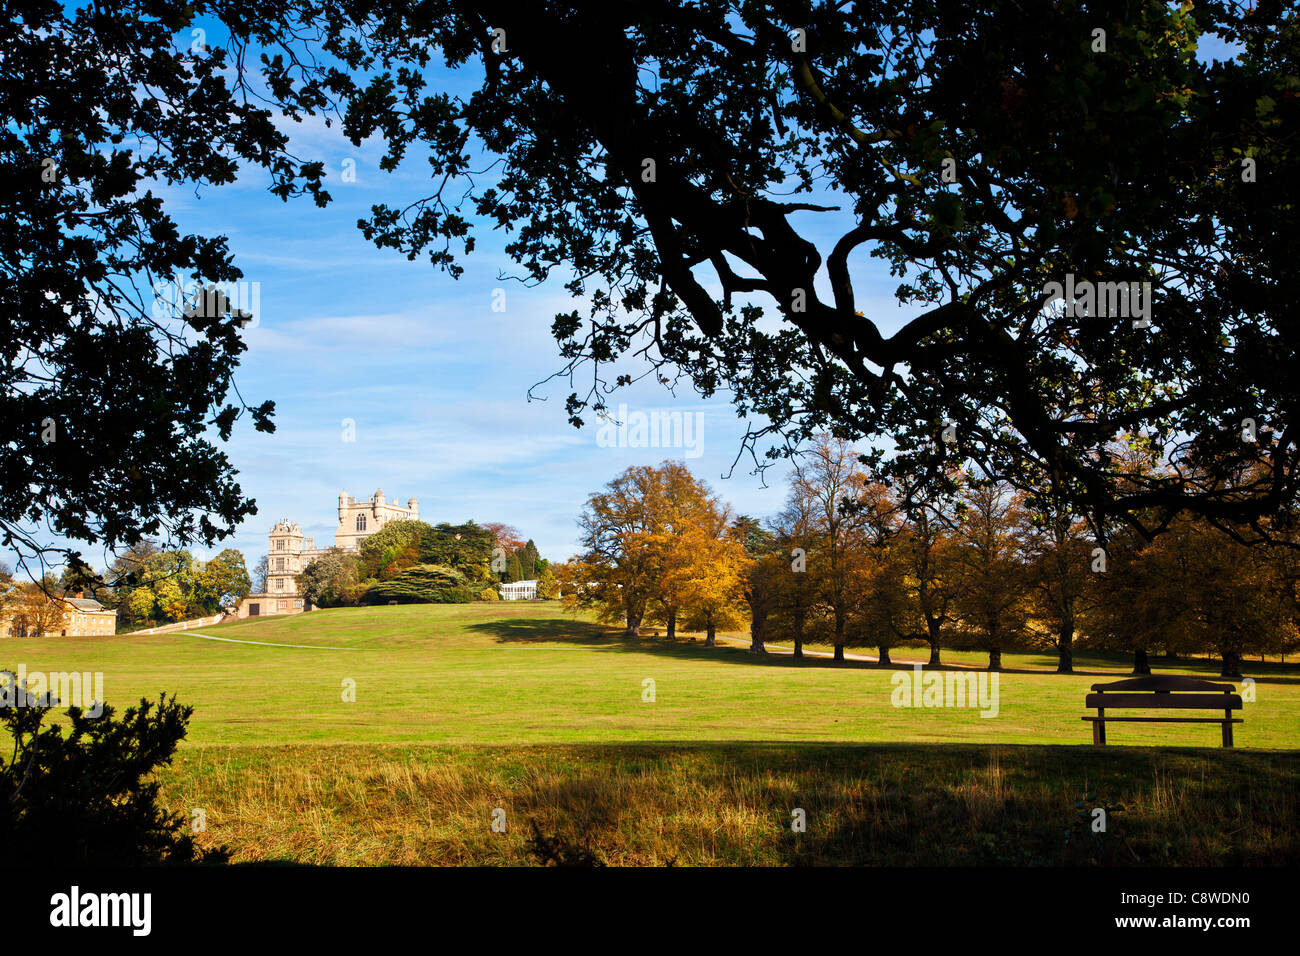 A sunny autumn day at Wollaton Hall and Park, Nottingham, Nottinghamshire, England, UK - Stock Image